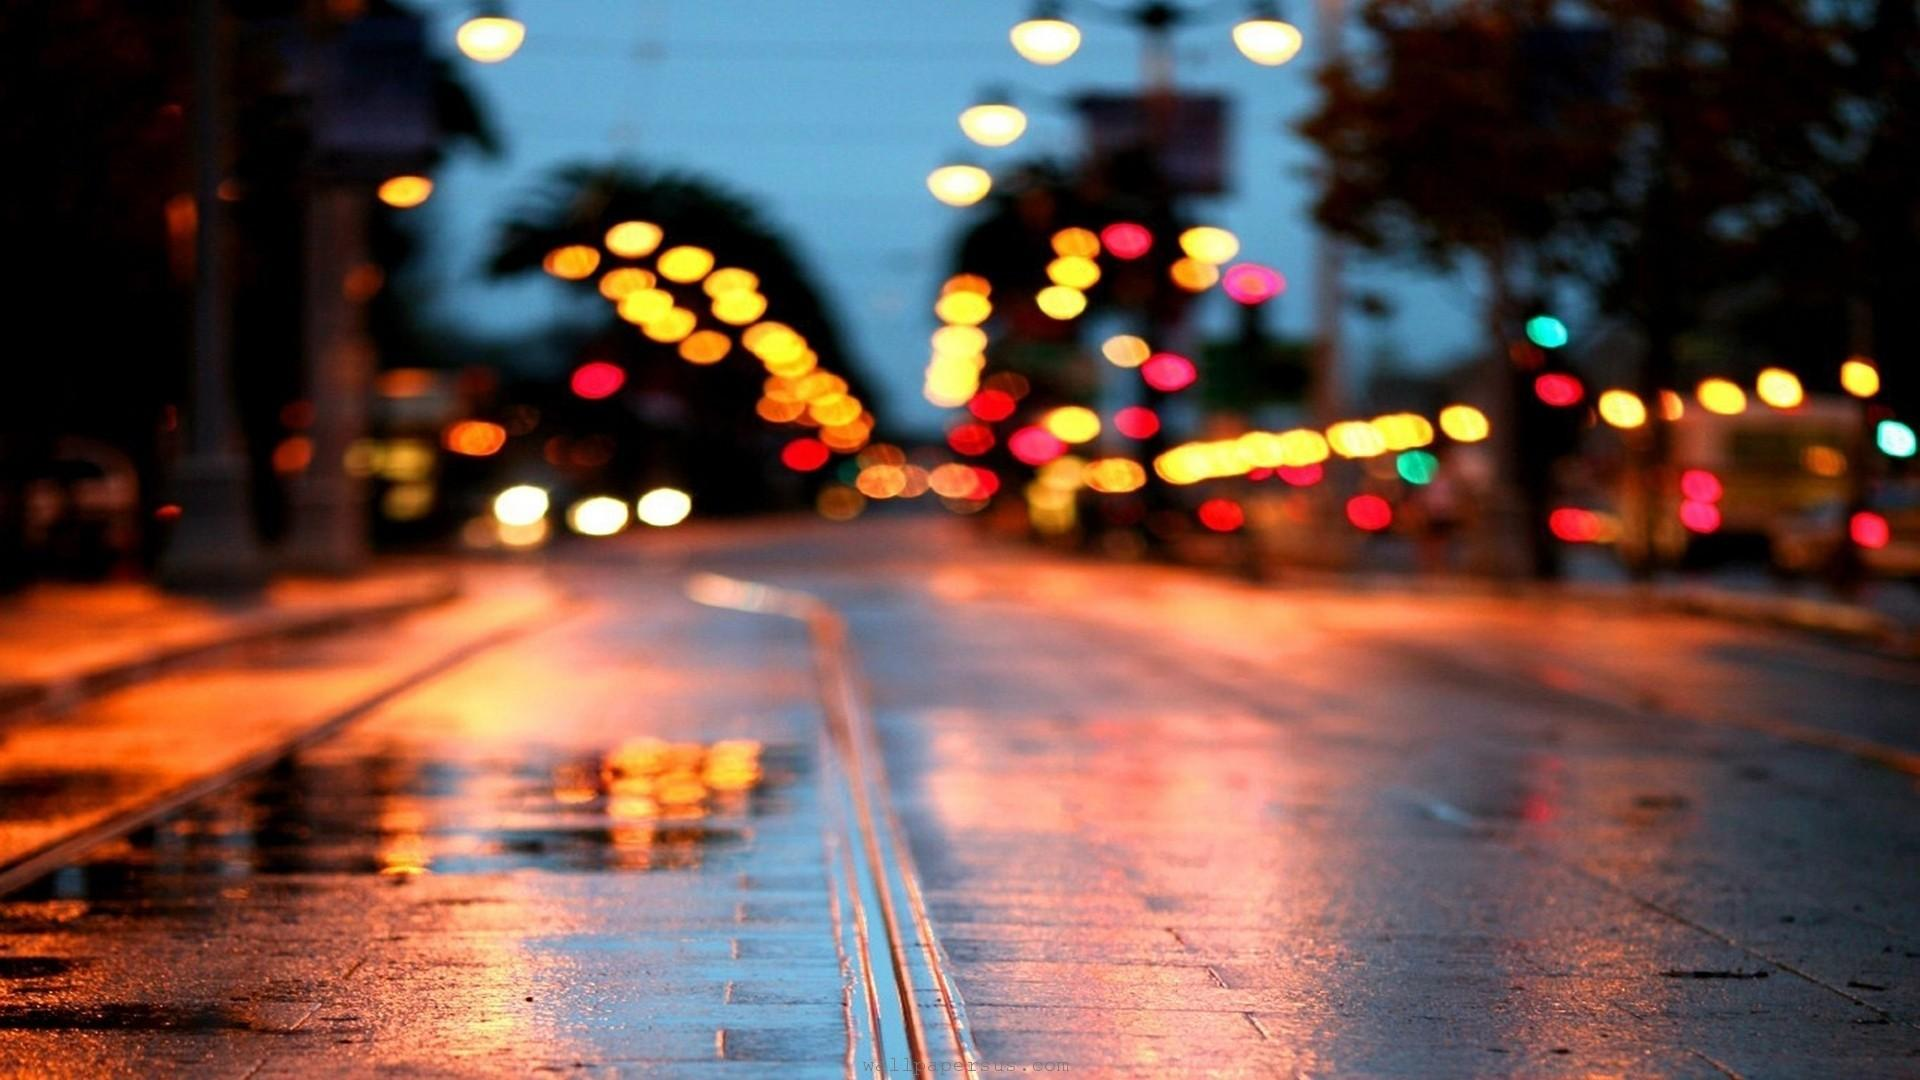 City Scape Digital Backgrounds